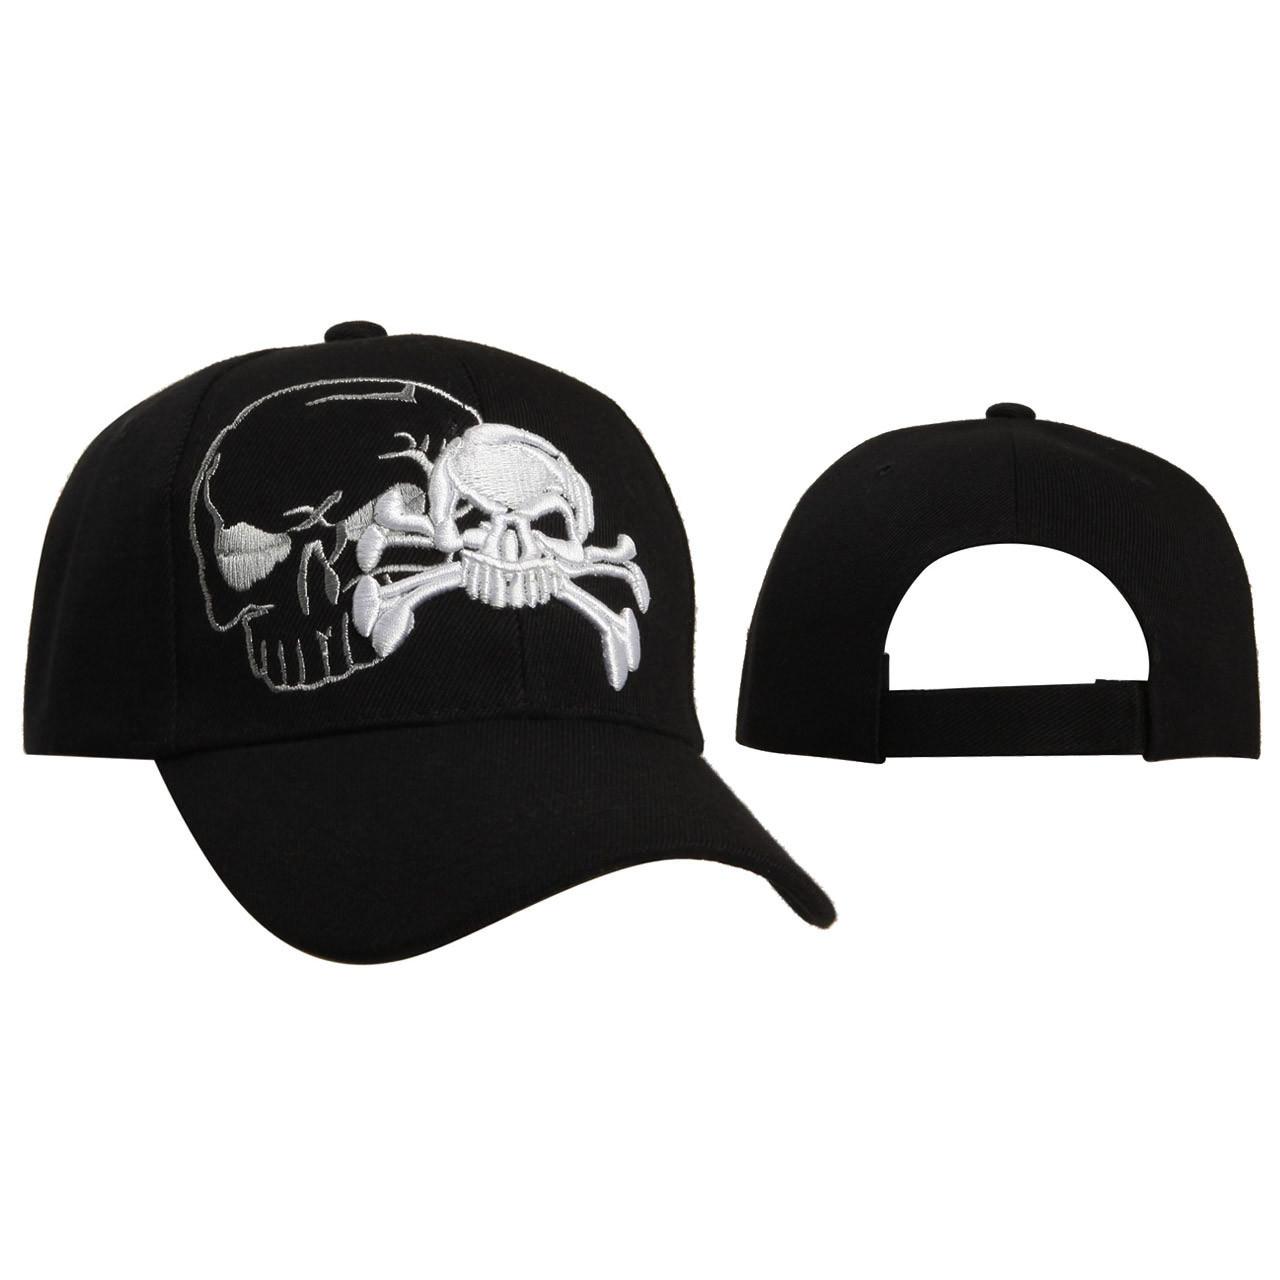 Baseball Caps Wholesale C5209 Skull   Cross Bones 704730a5a83